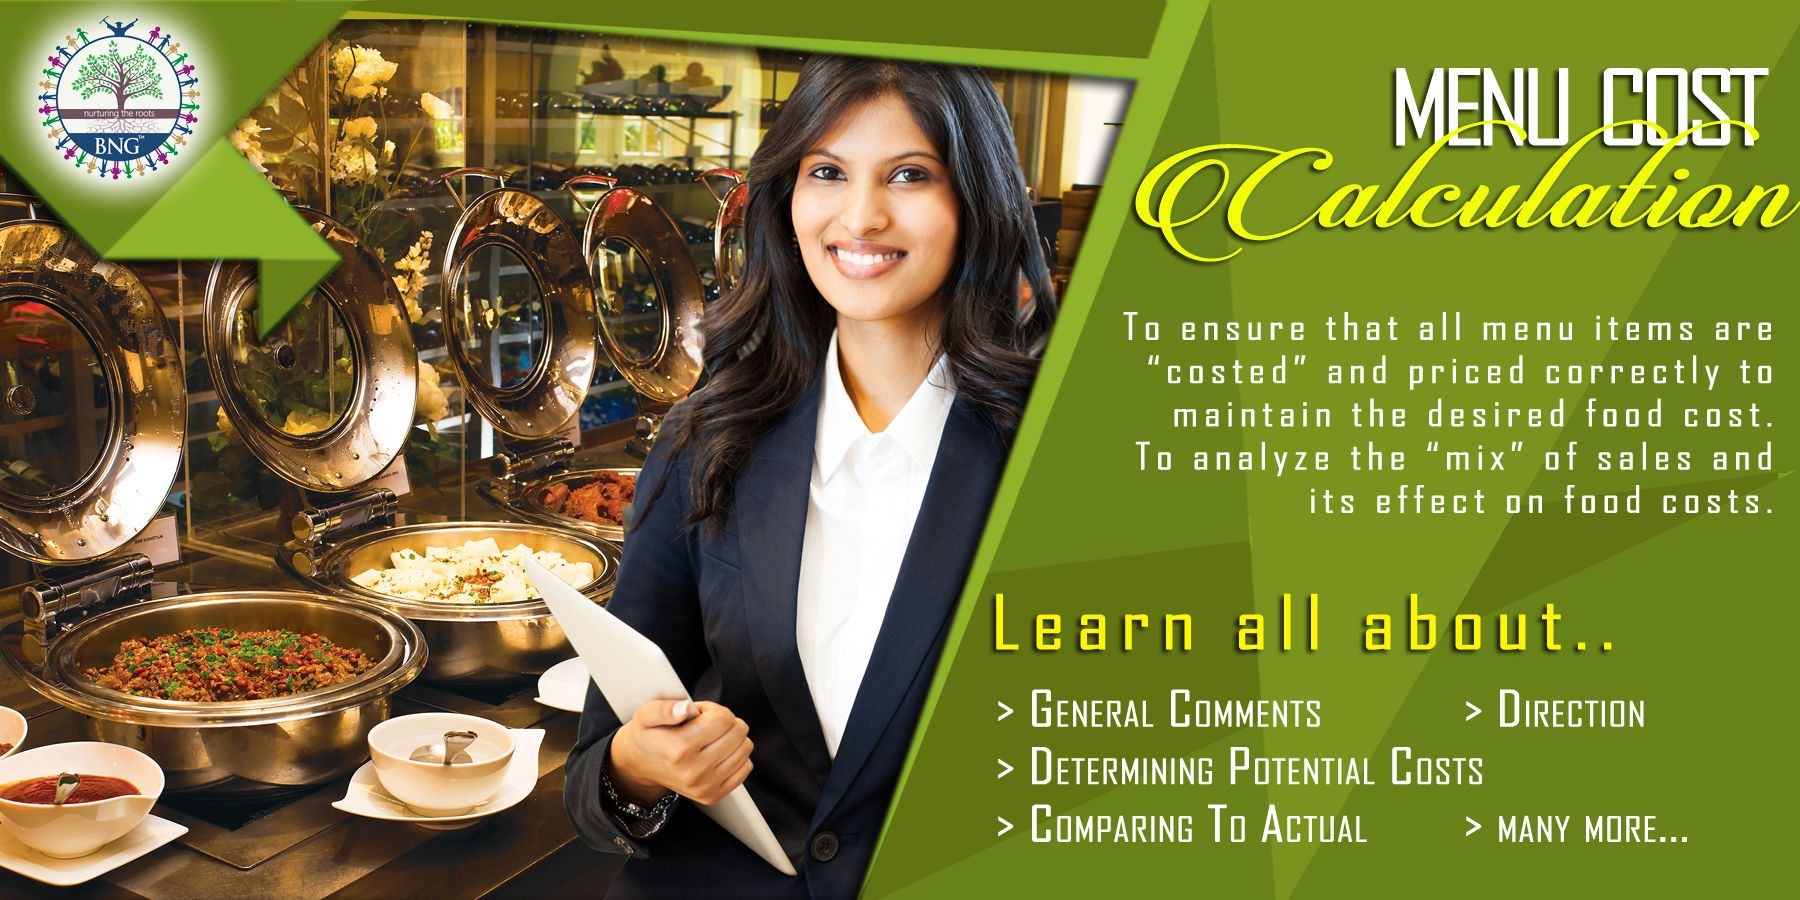 Hotel Restaurant Menu Cost Calculation by BNG Hotel Management Kolkata